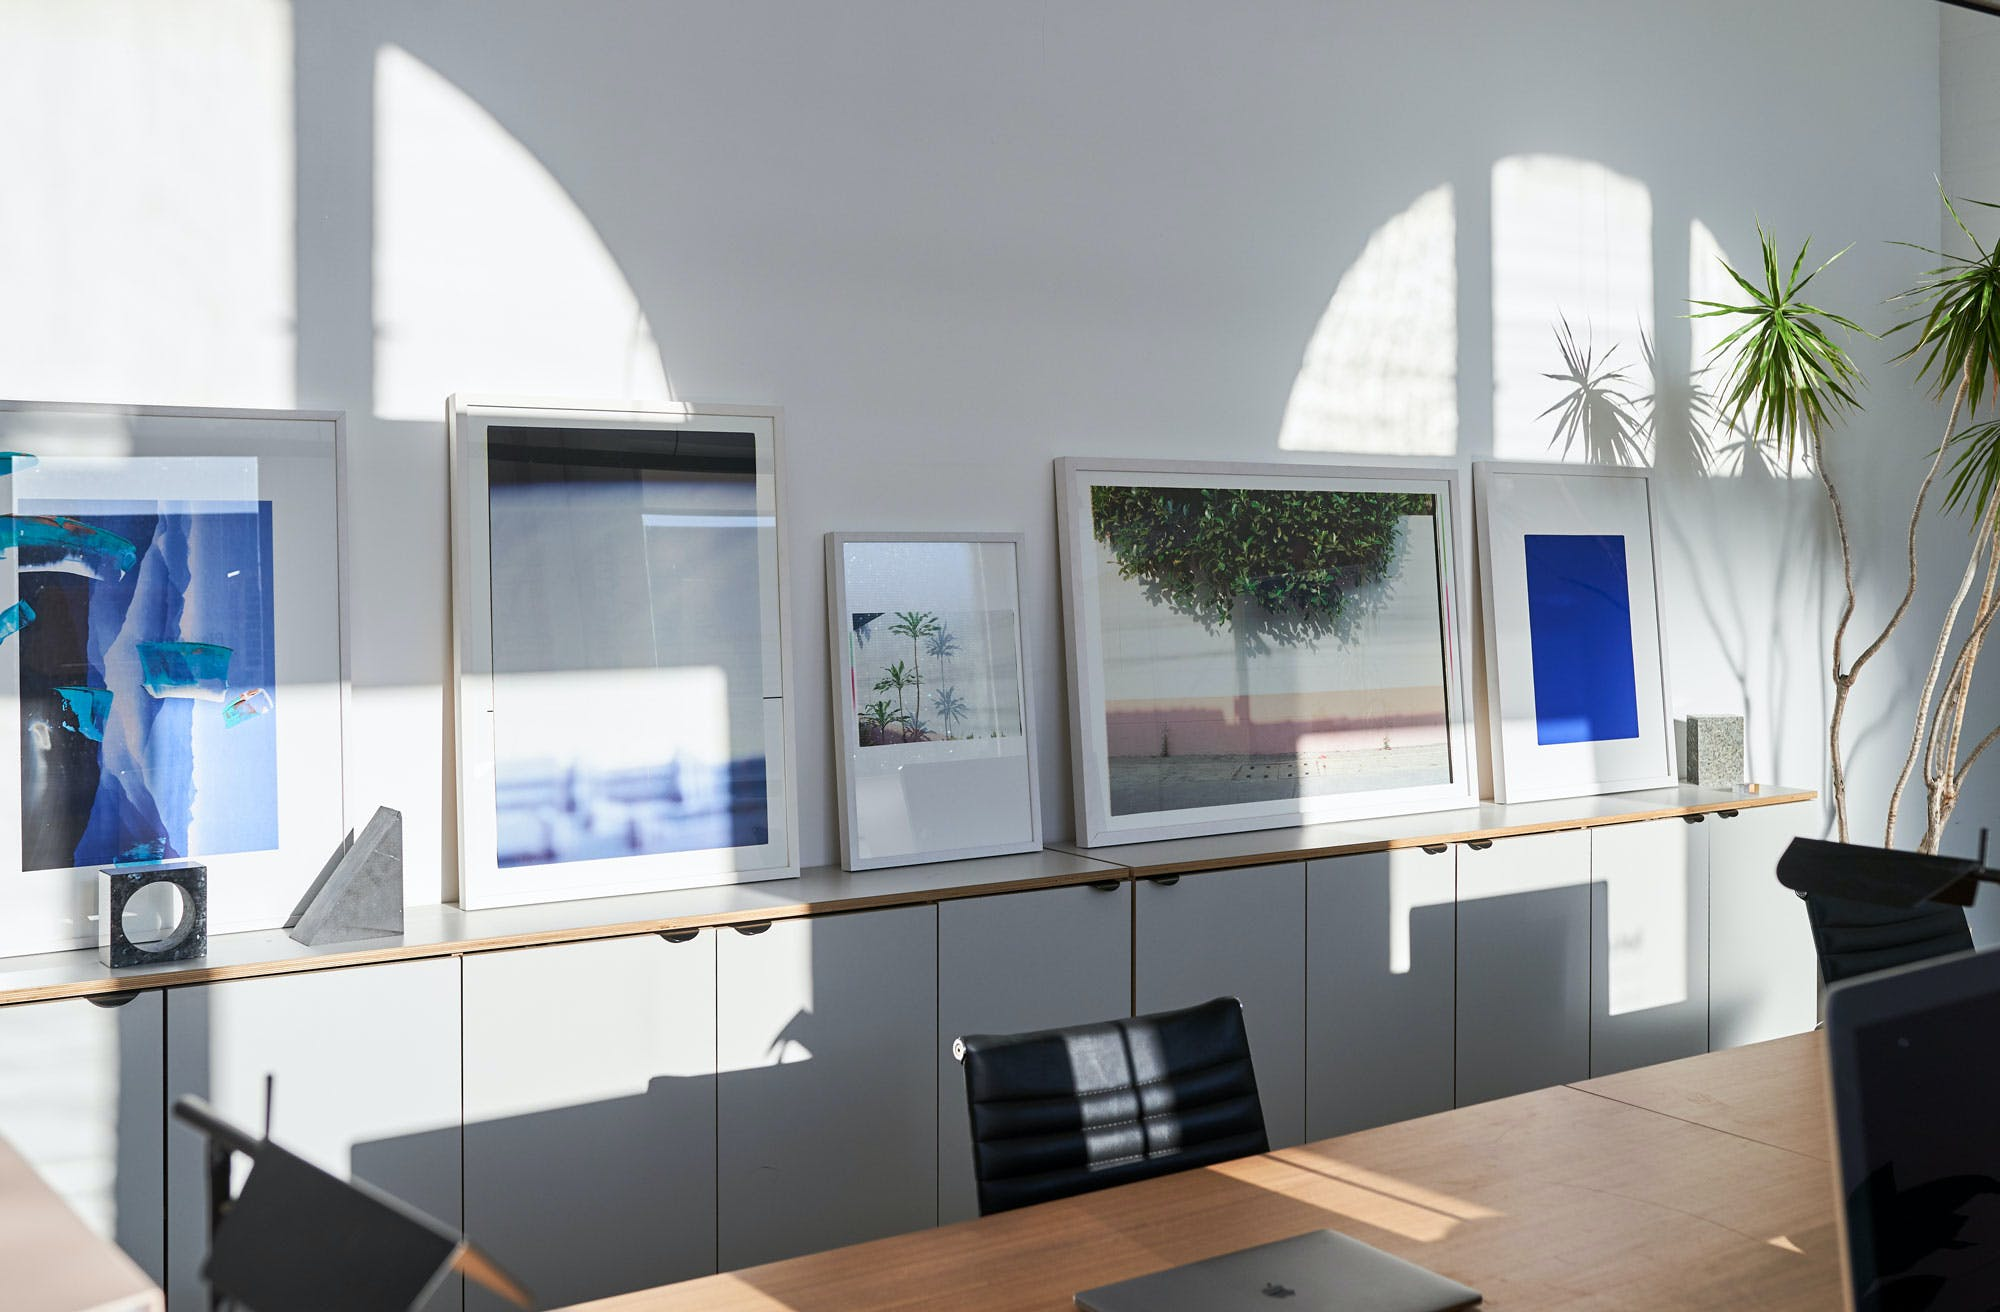 Hardwick Studio, creative studio at Hardwick Building, image 1